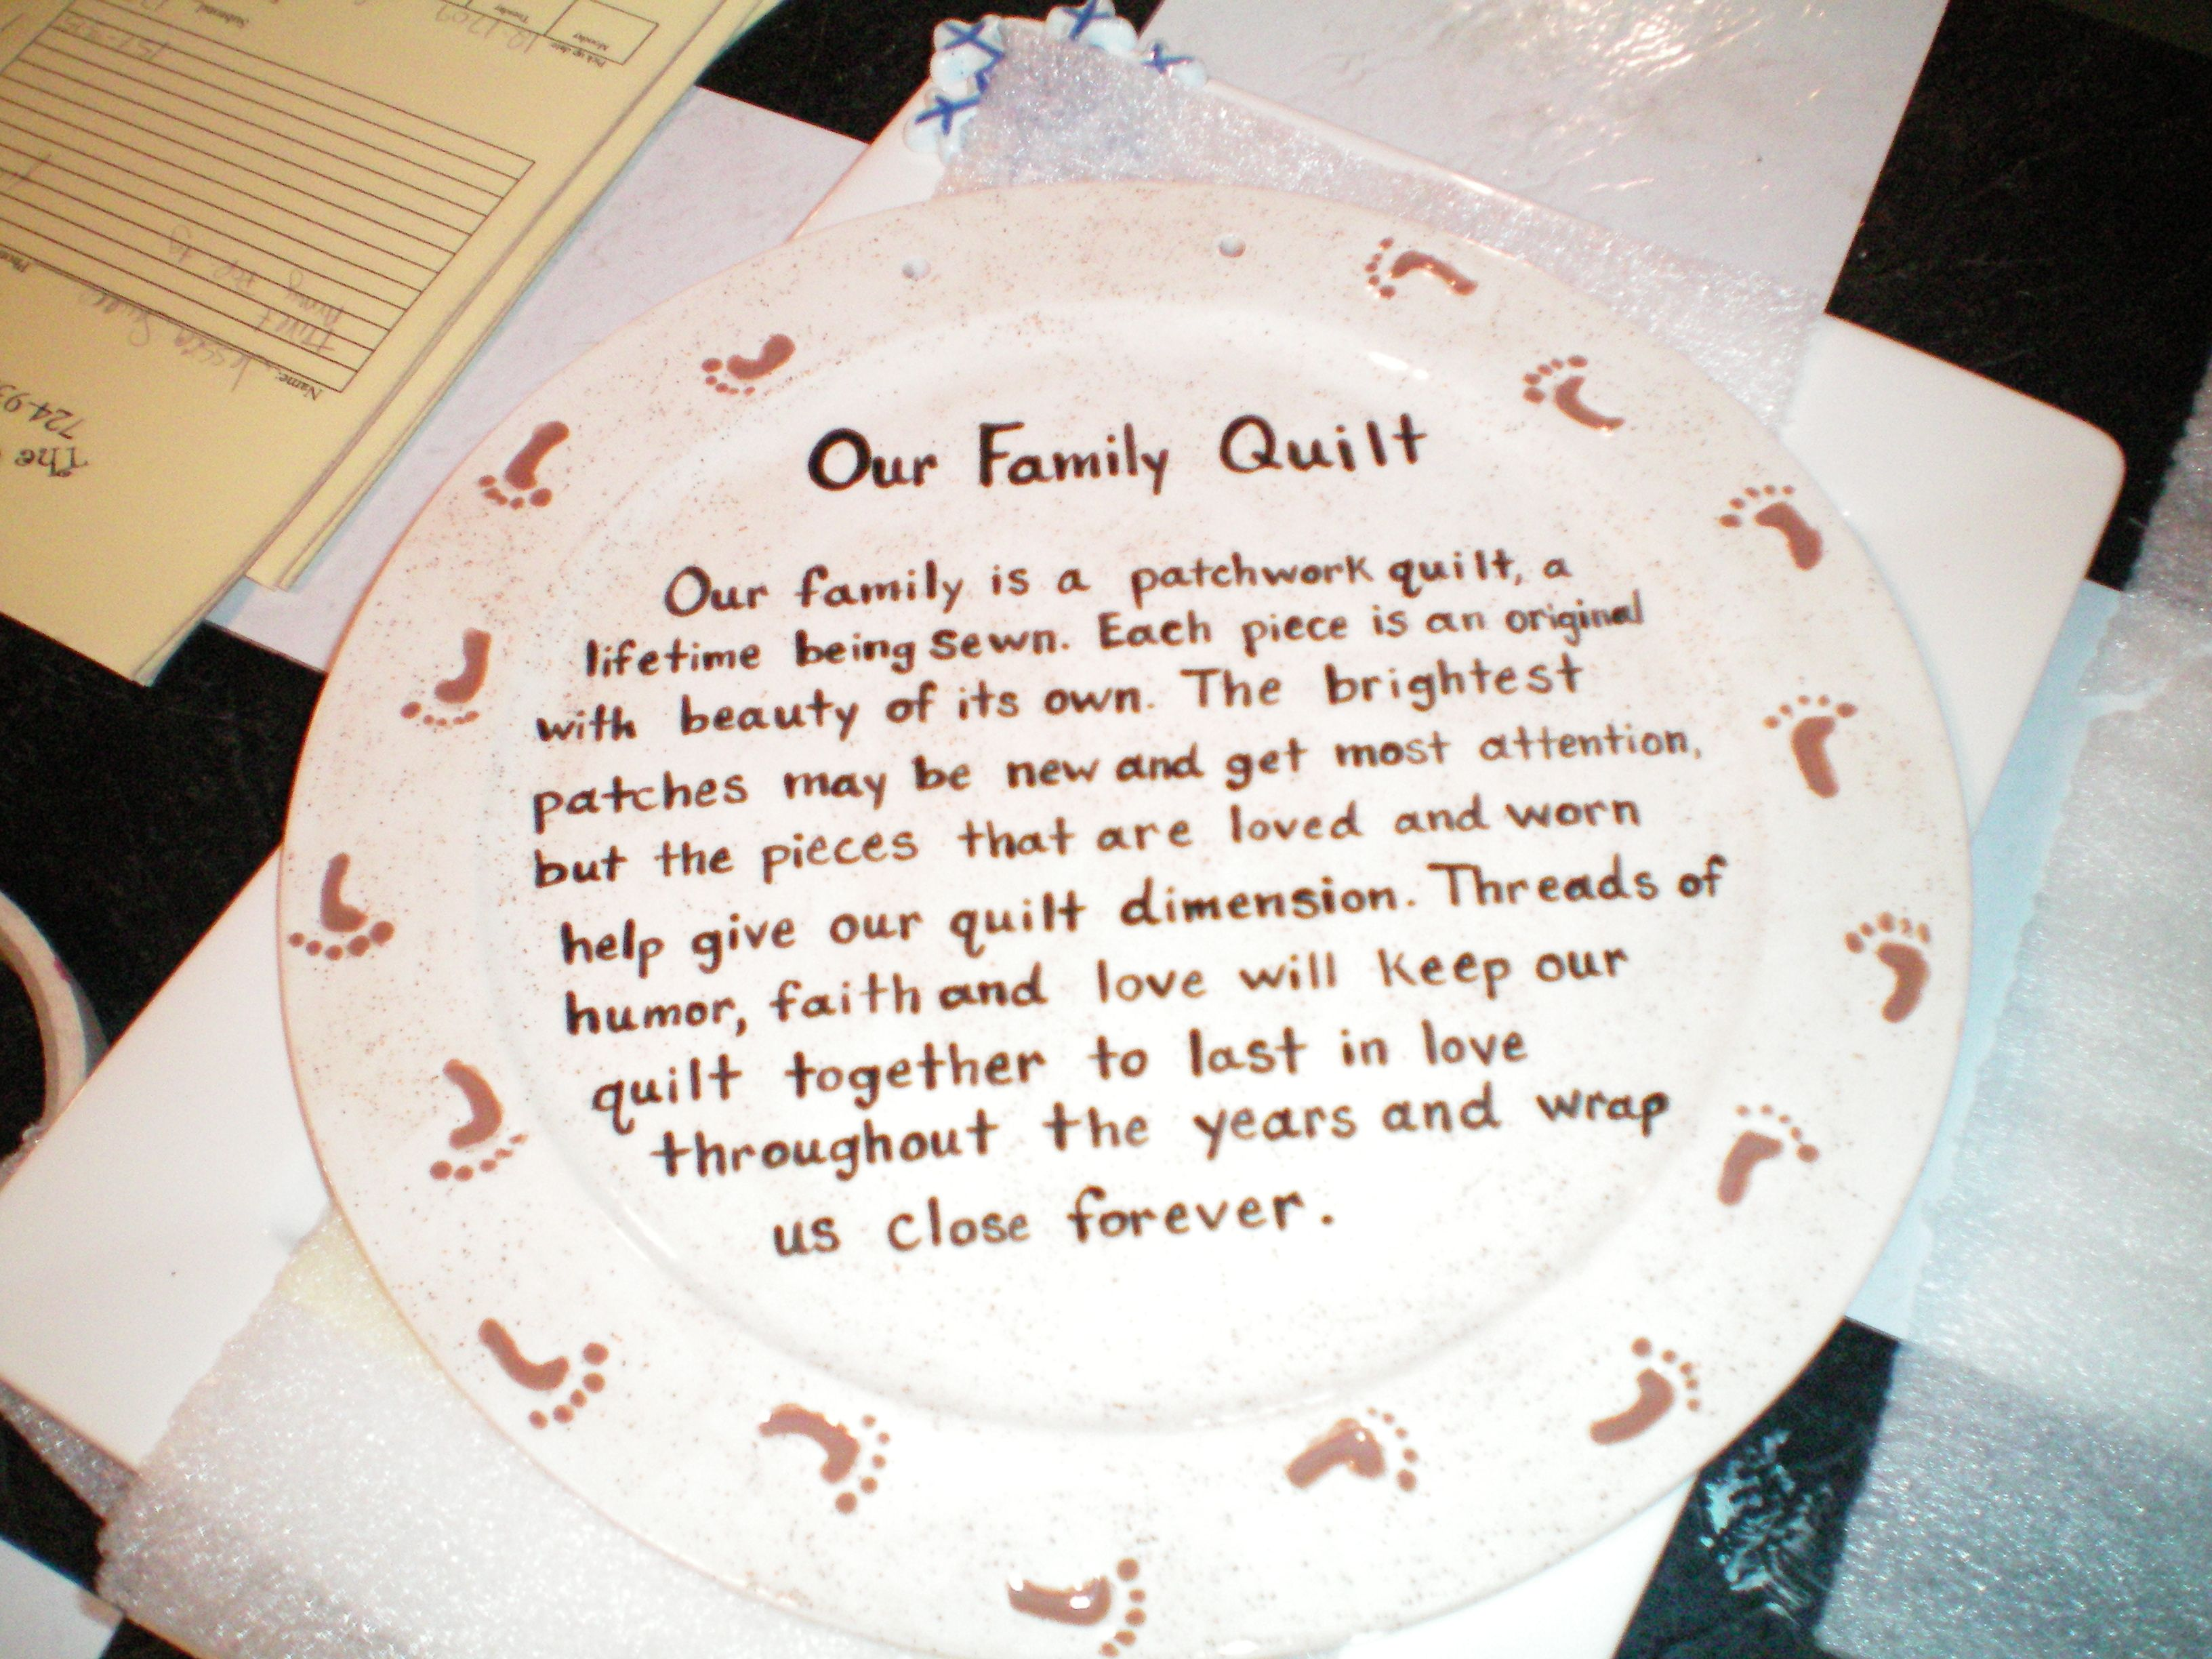 Family Quilt Quotes Quotesgram Messages Quilting